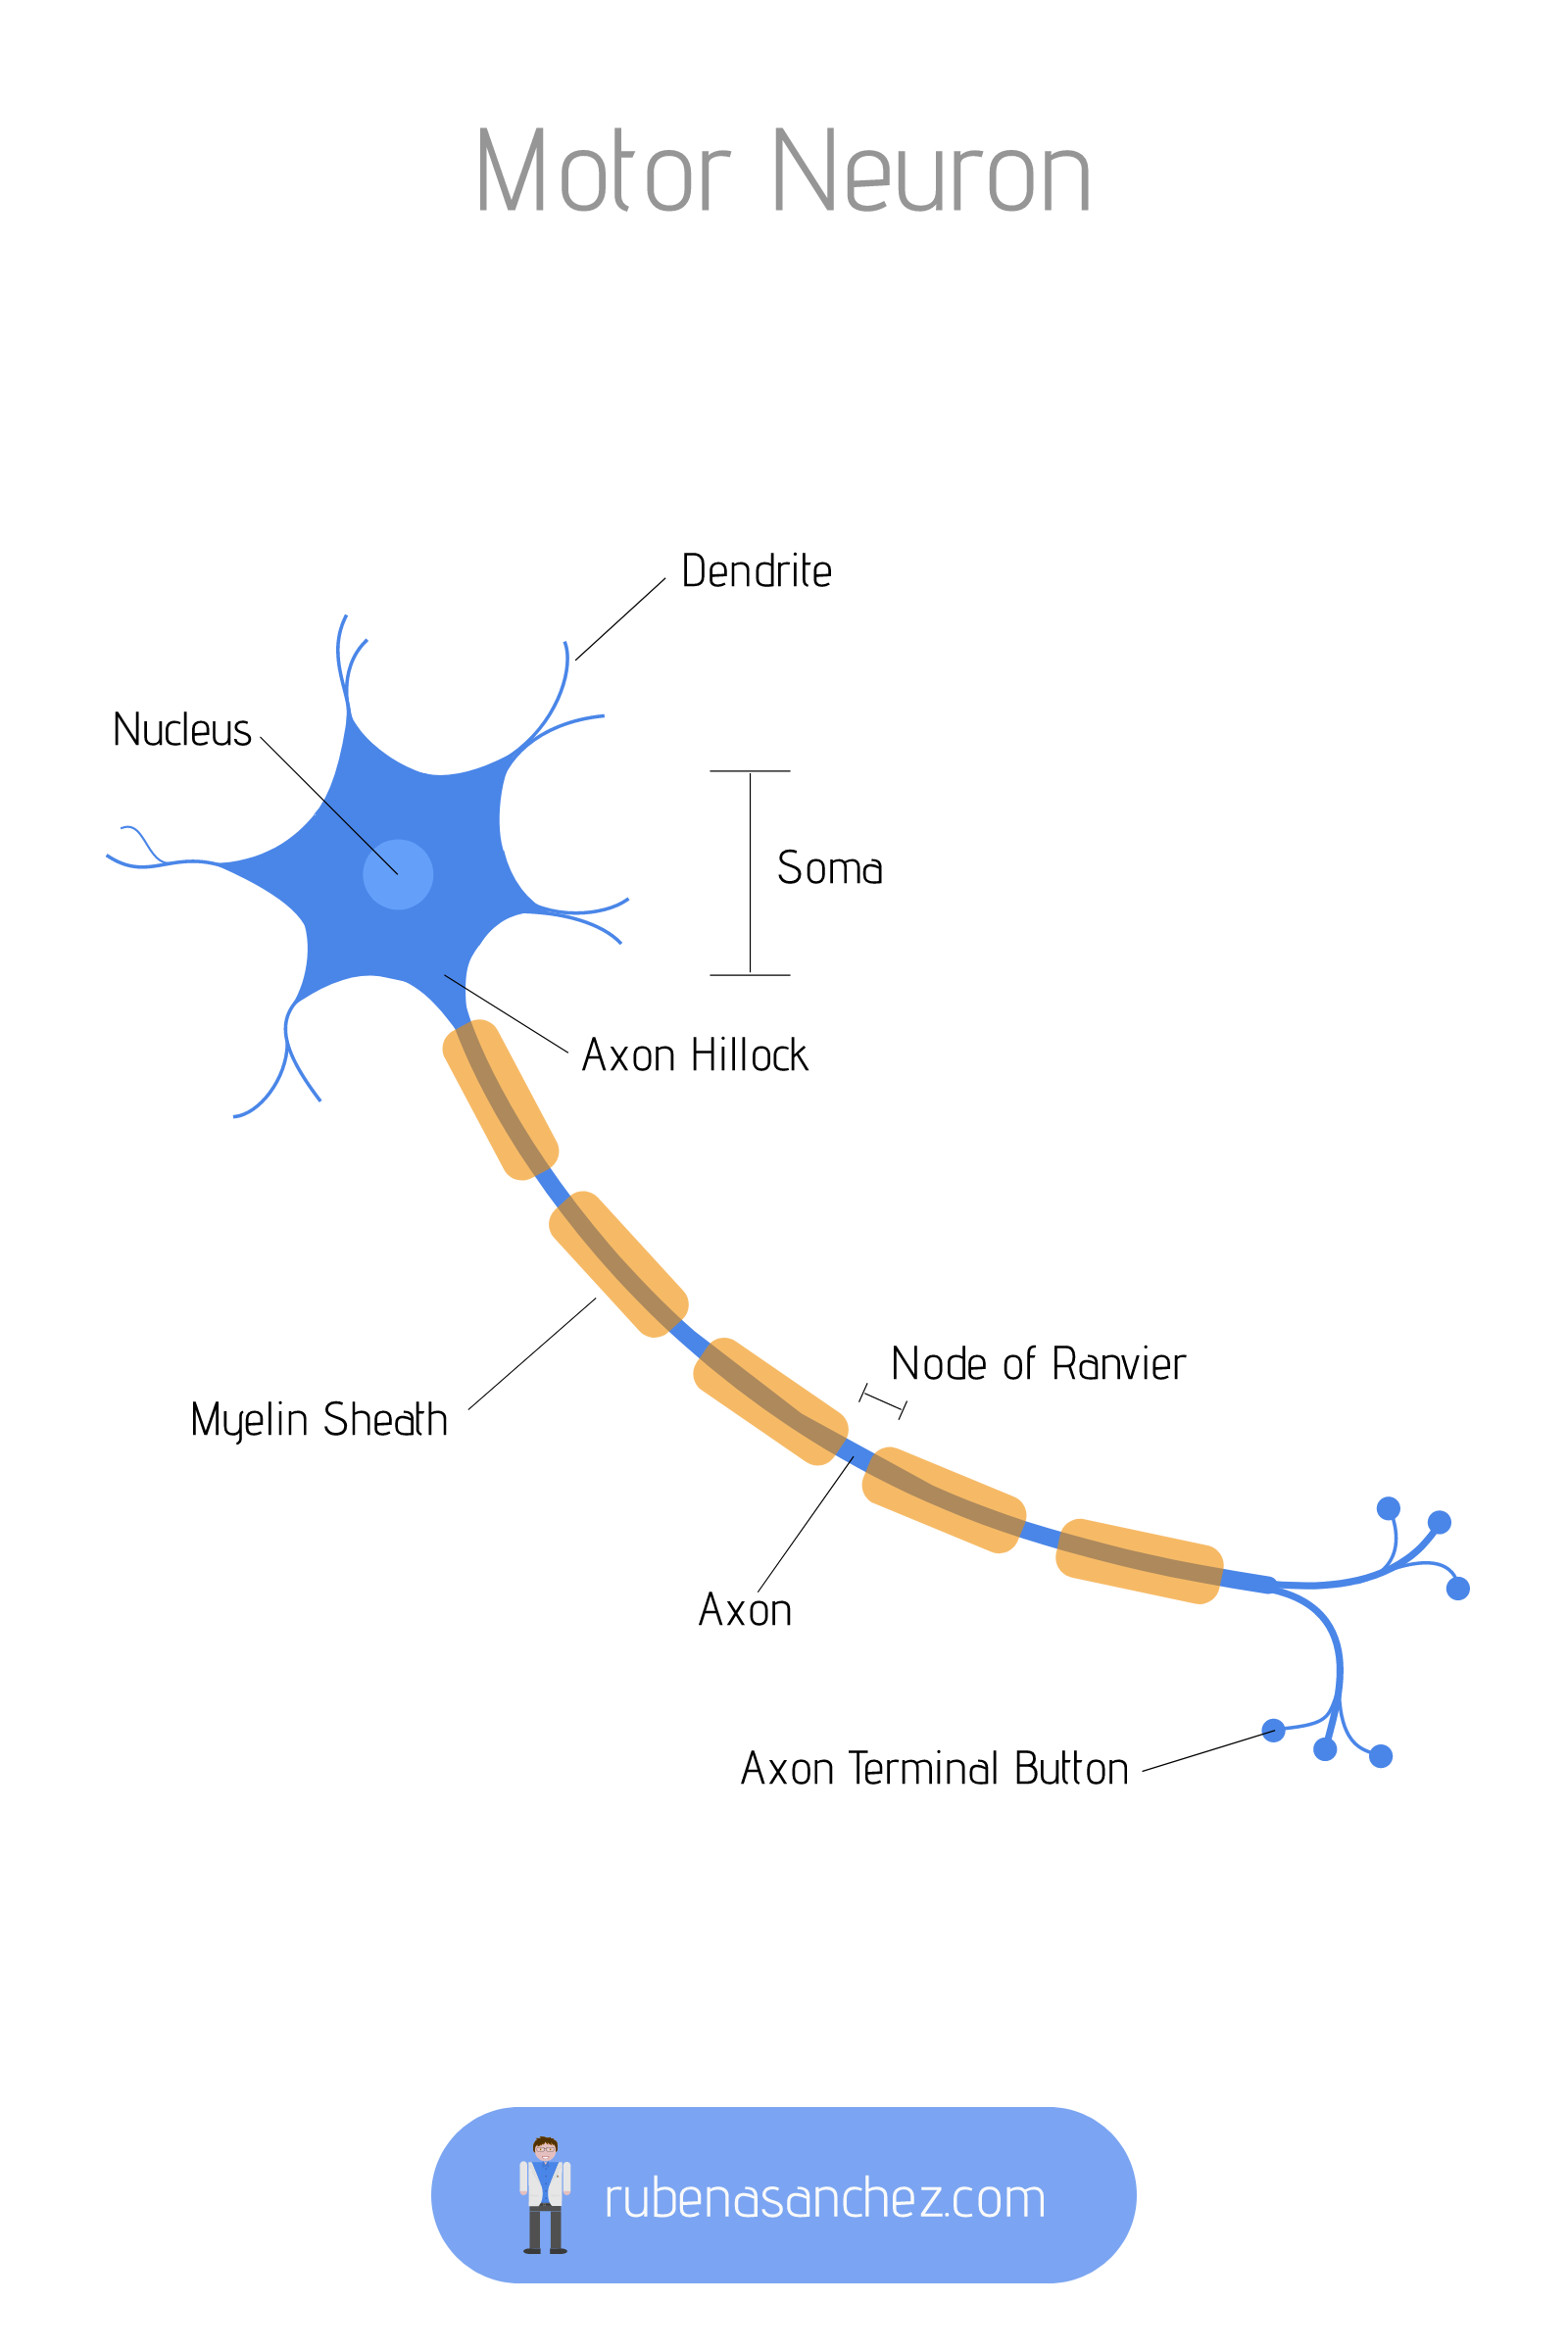 Illustration Of A Motor Neuron Including Its Major Anatomical